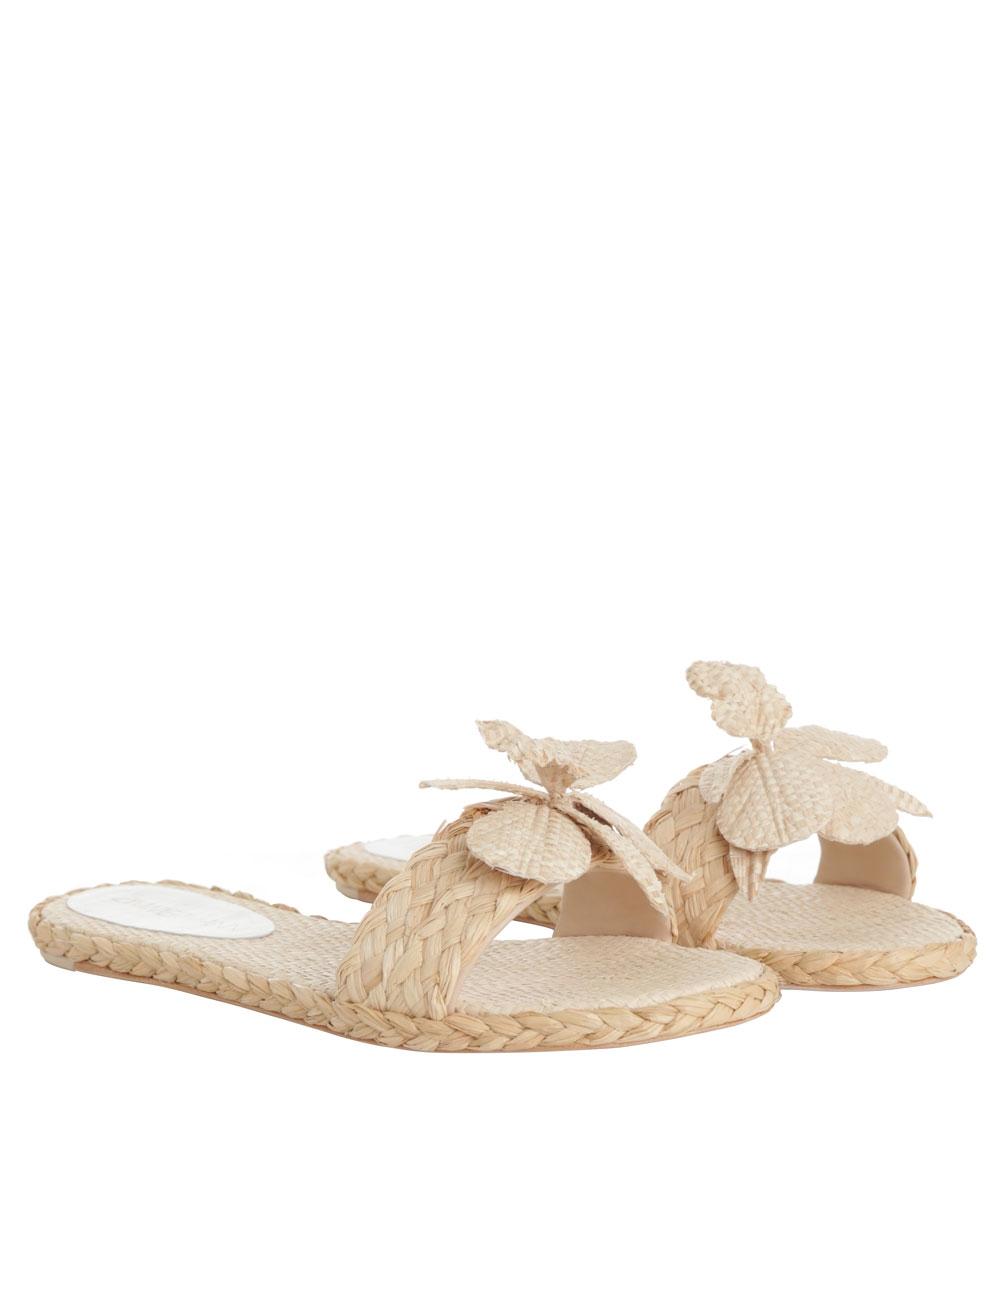 aaac69798d0ea Shop Women's Designer Shoes Online | ZIMMERMANN